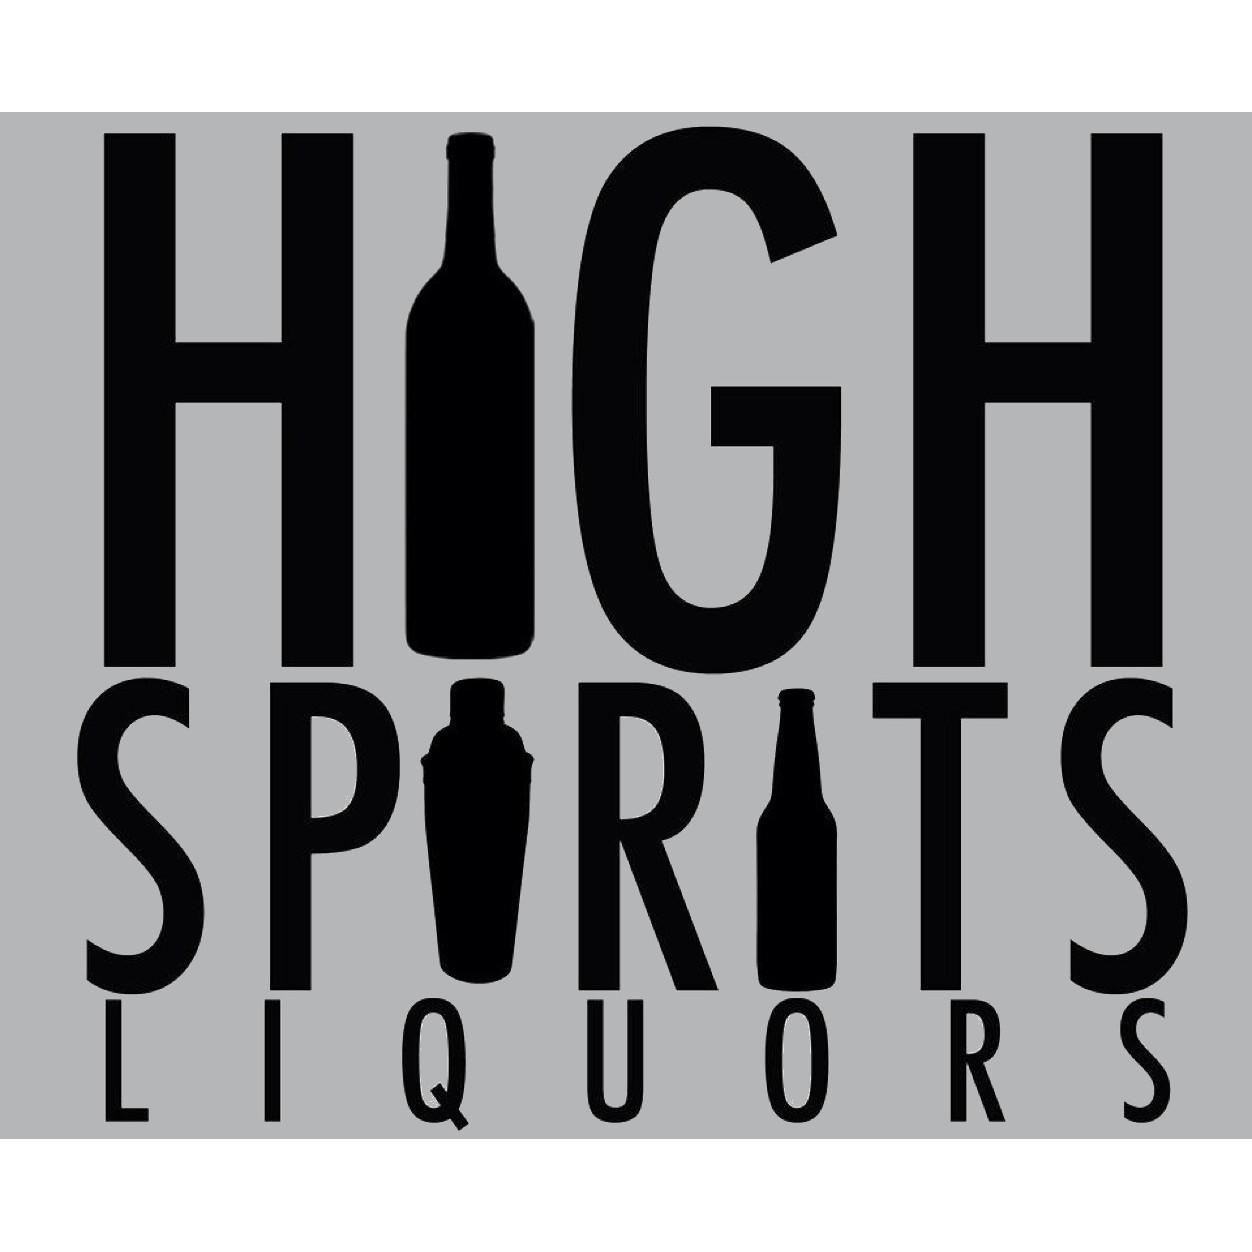 High Spirits Liquors